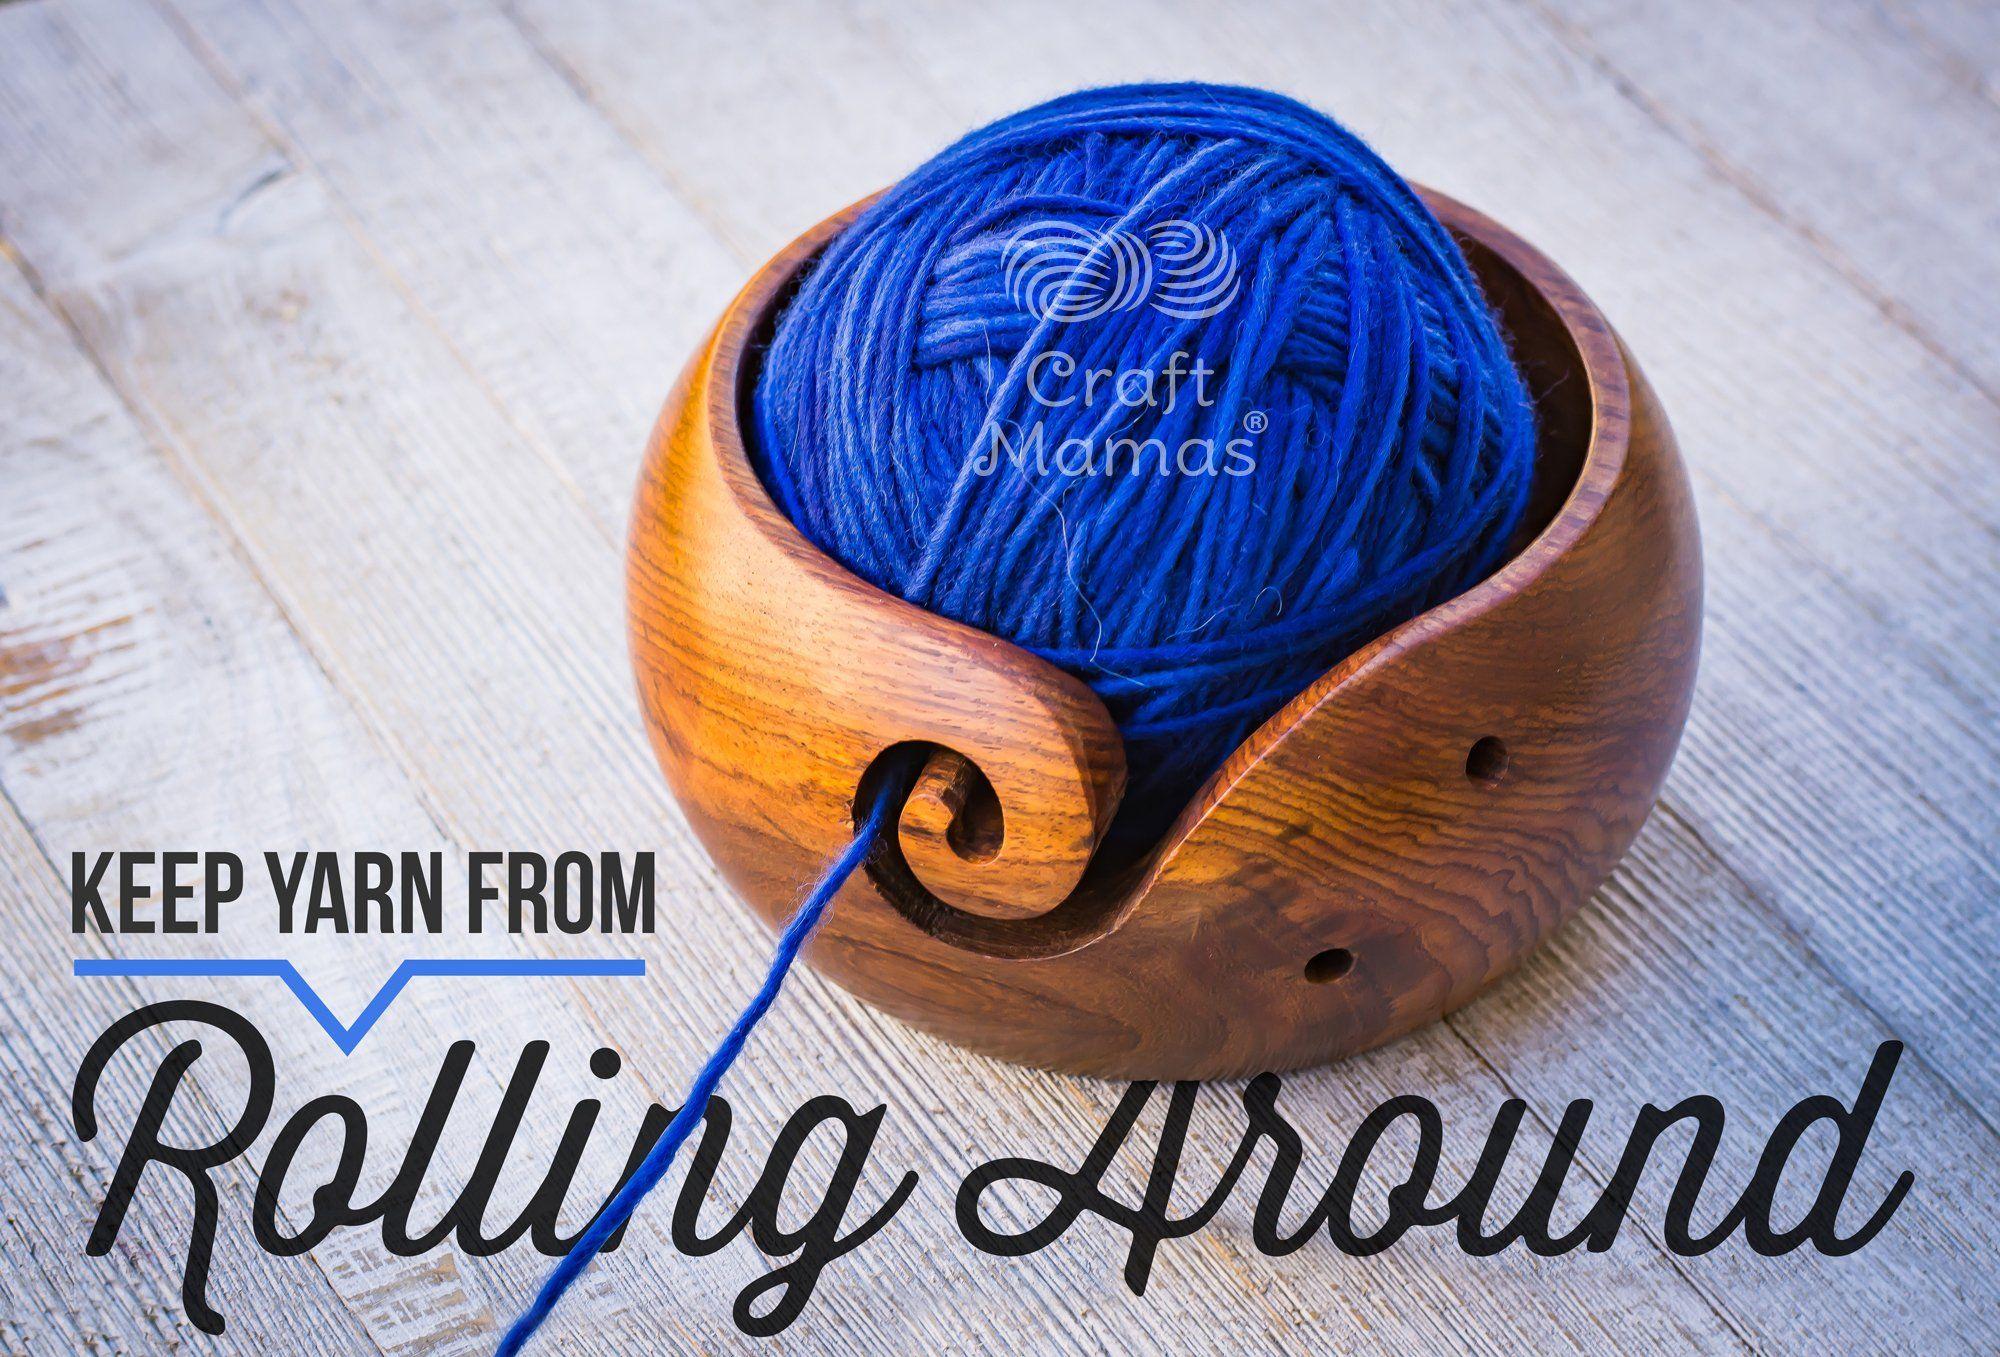 Wooden Yarn Bowl Holder Rosewood Knitting Bowl W//Holes Storage Crochet Yarn